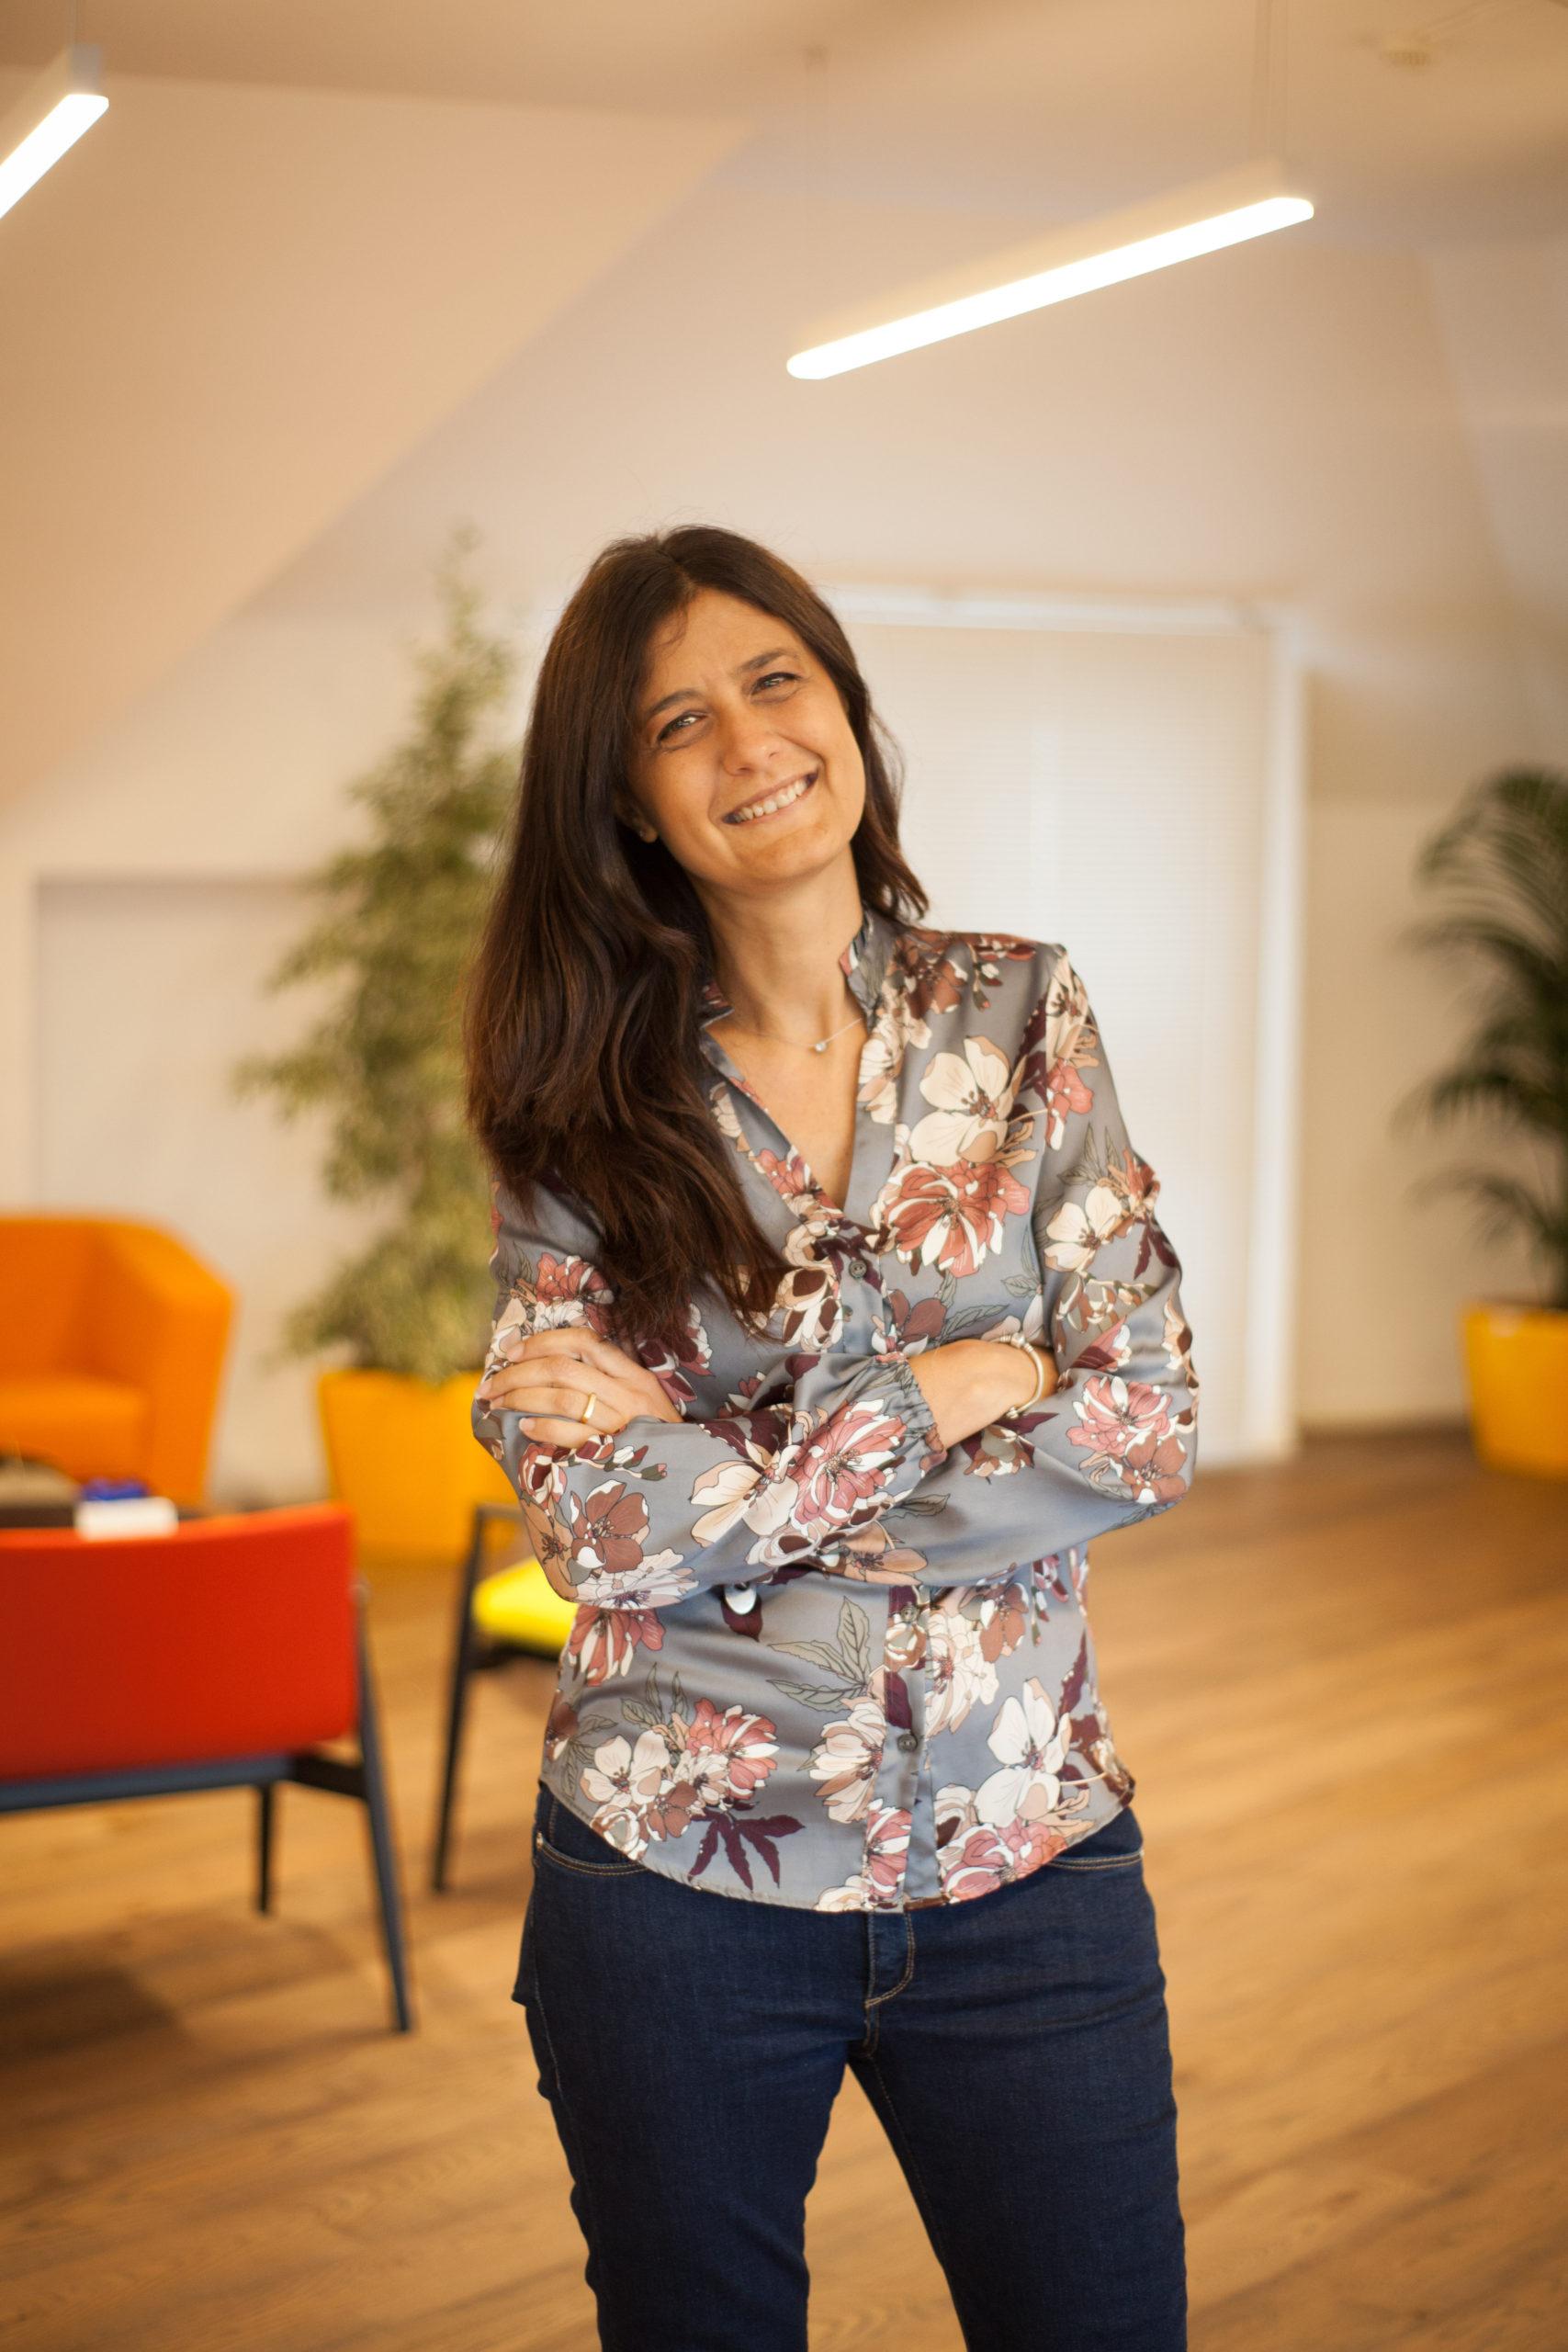 A portrait of CyberEthics Co-Founder Carmela Occhipinti